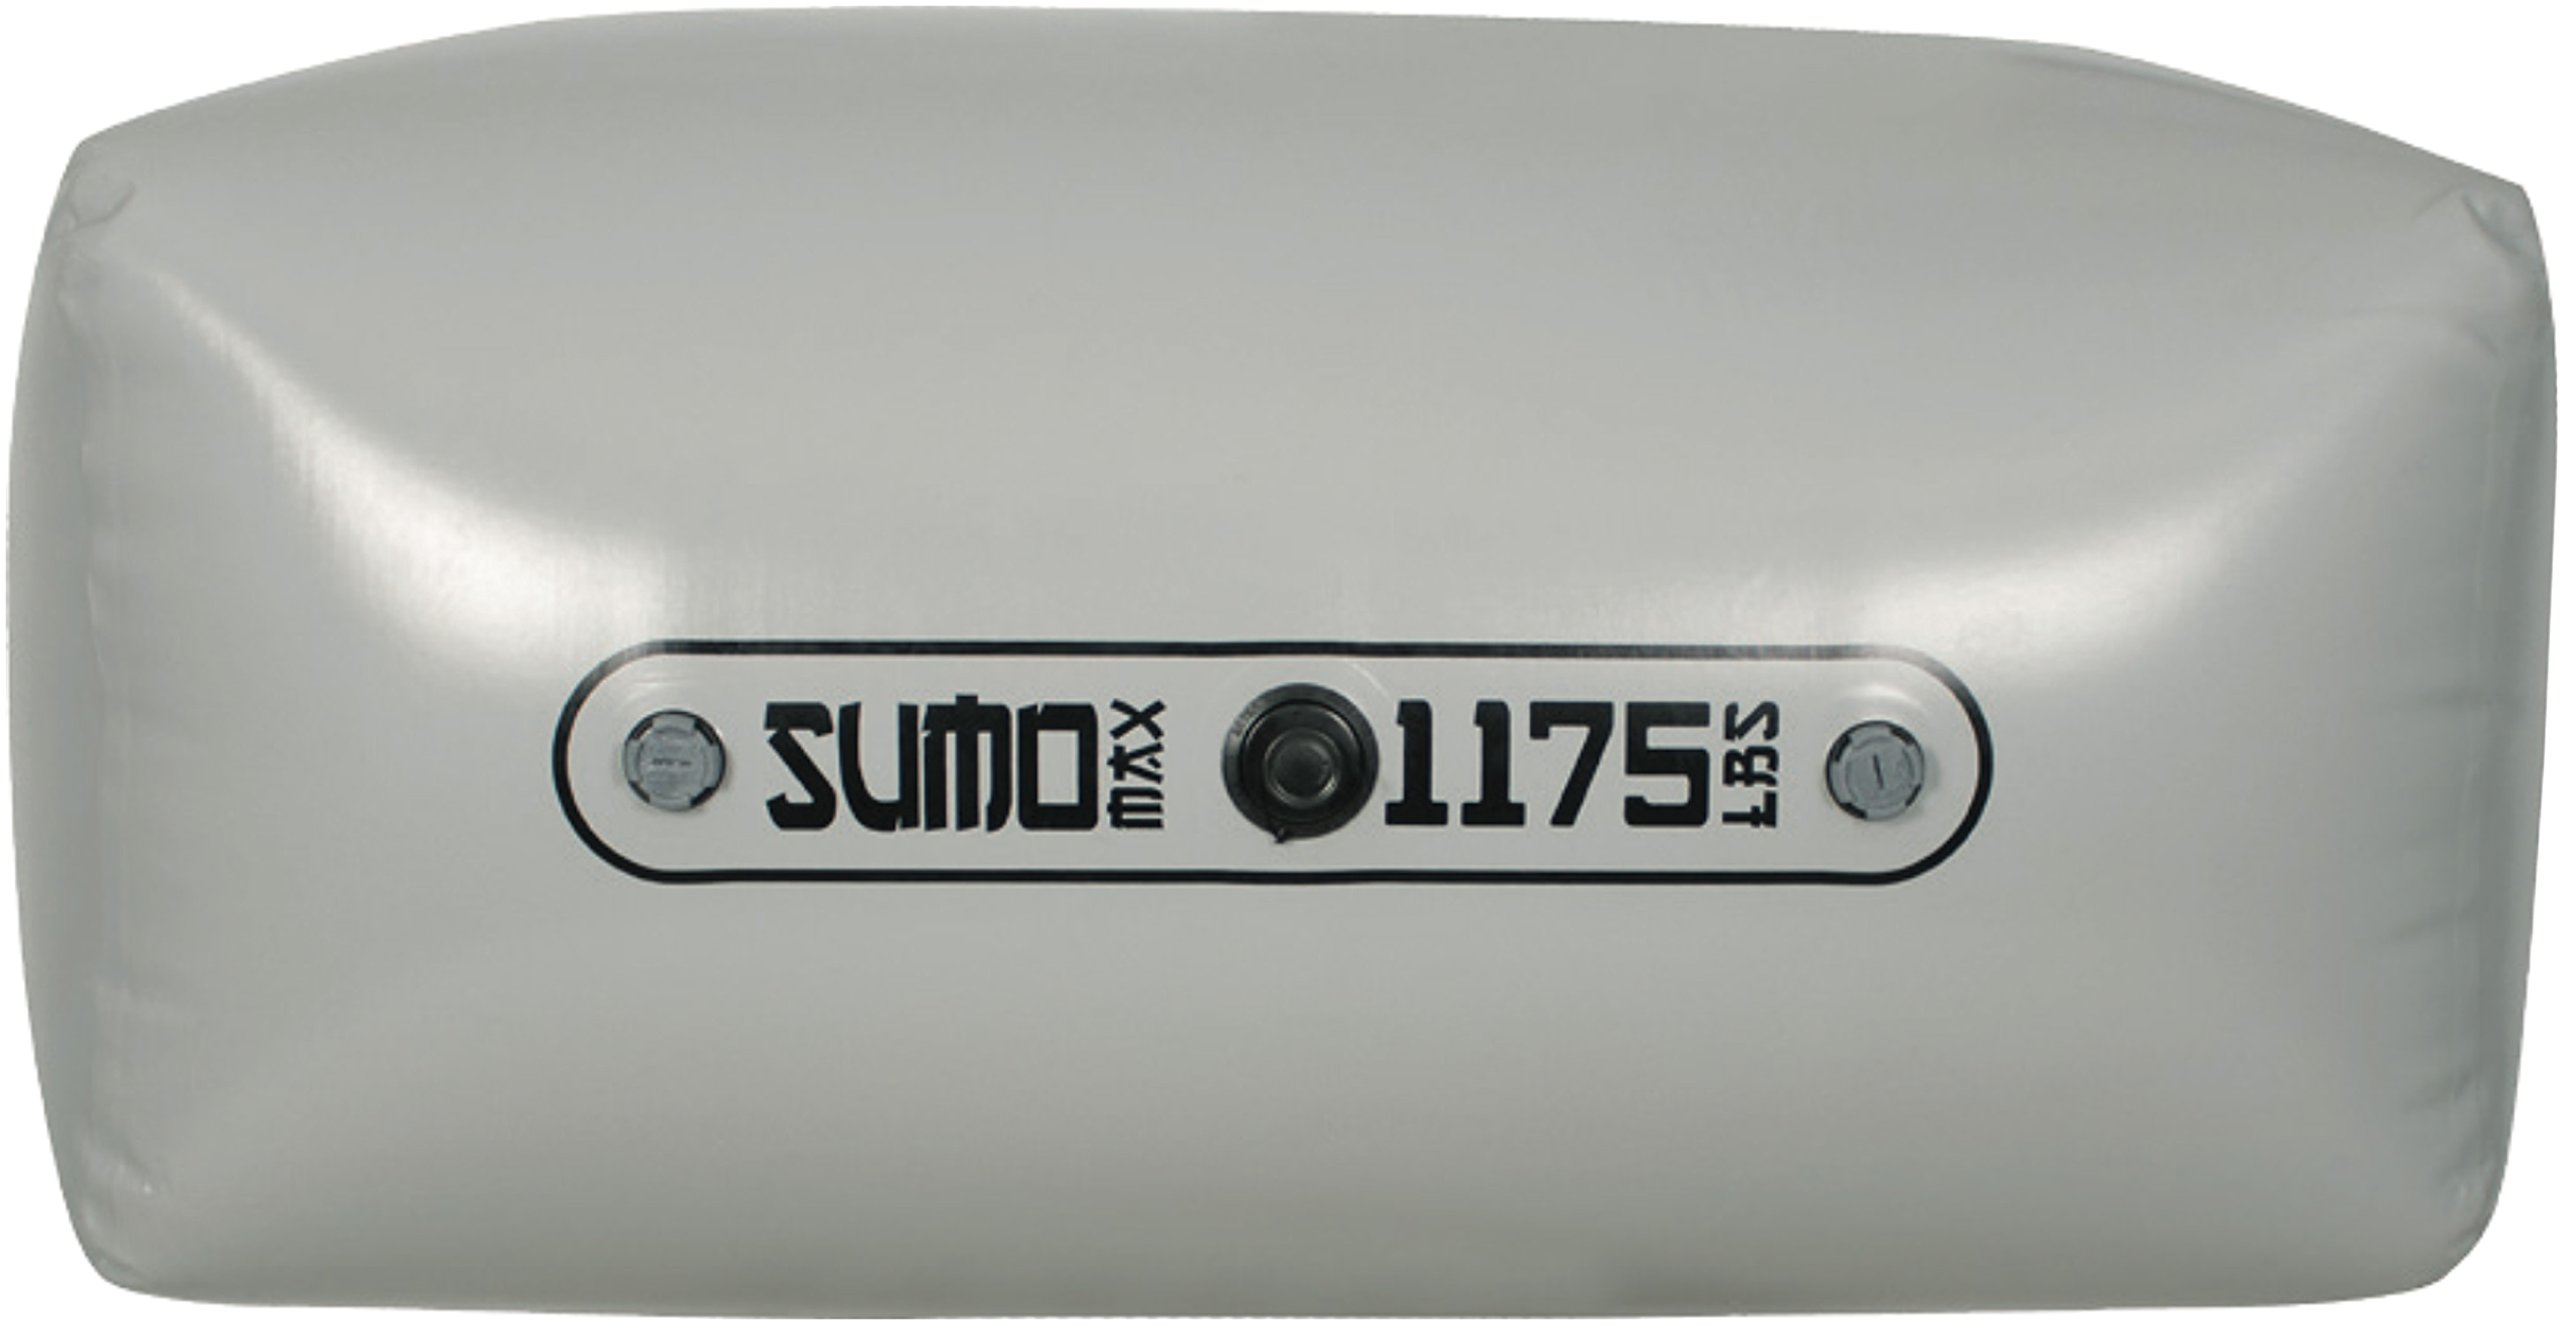 Straight Line Sumo Max 1175 Ballast Bag Sz 1175lbs by Straightline (Image #1)